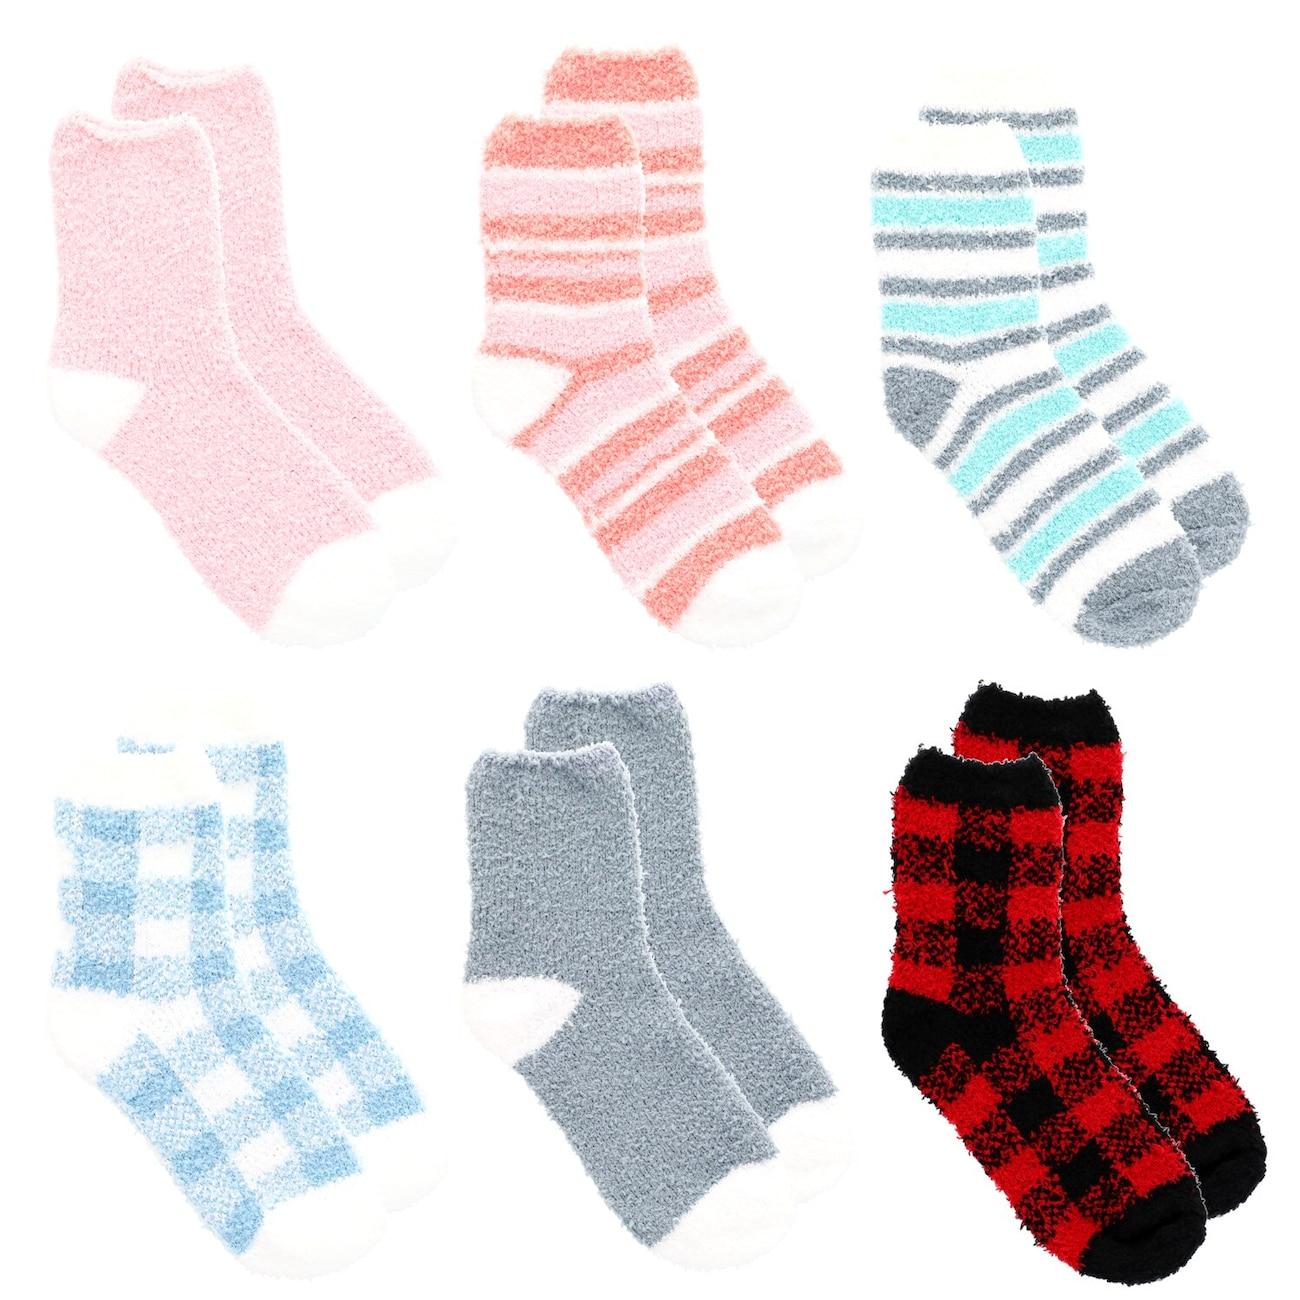 268c5019477e6 Ladies' Snugadoo Too Super-Soft Socks